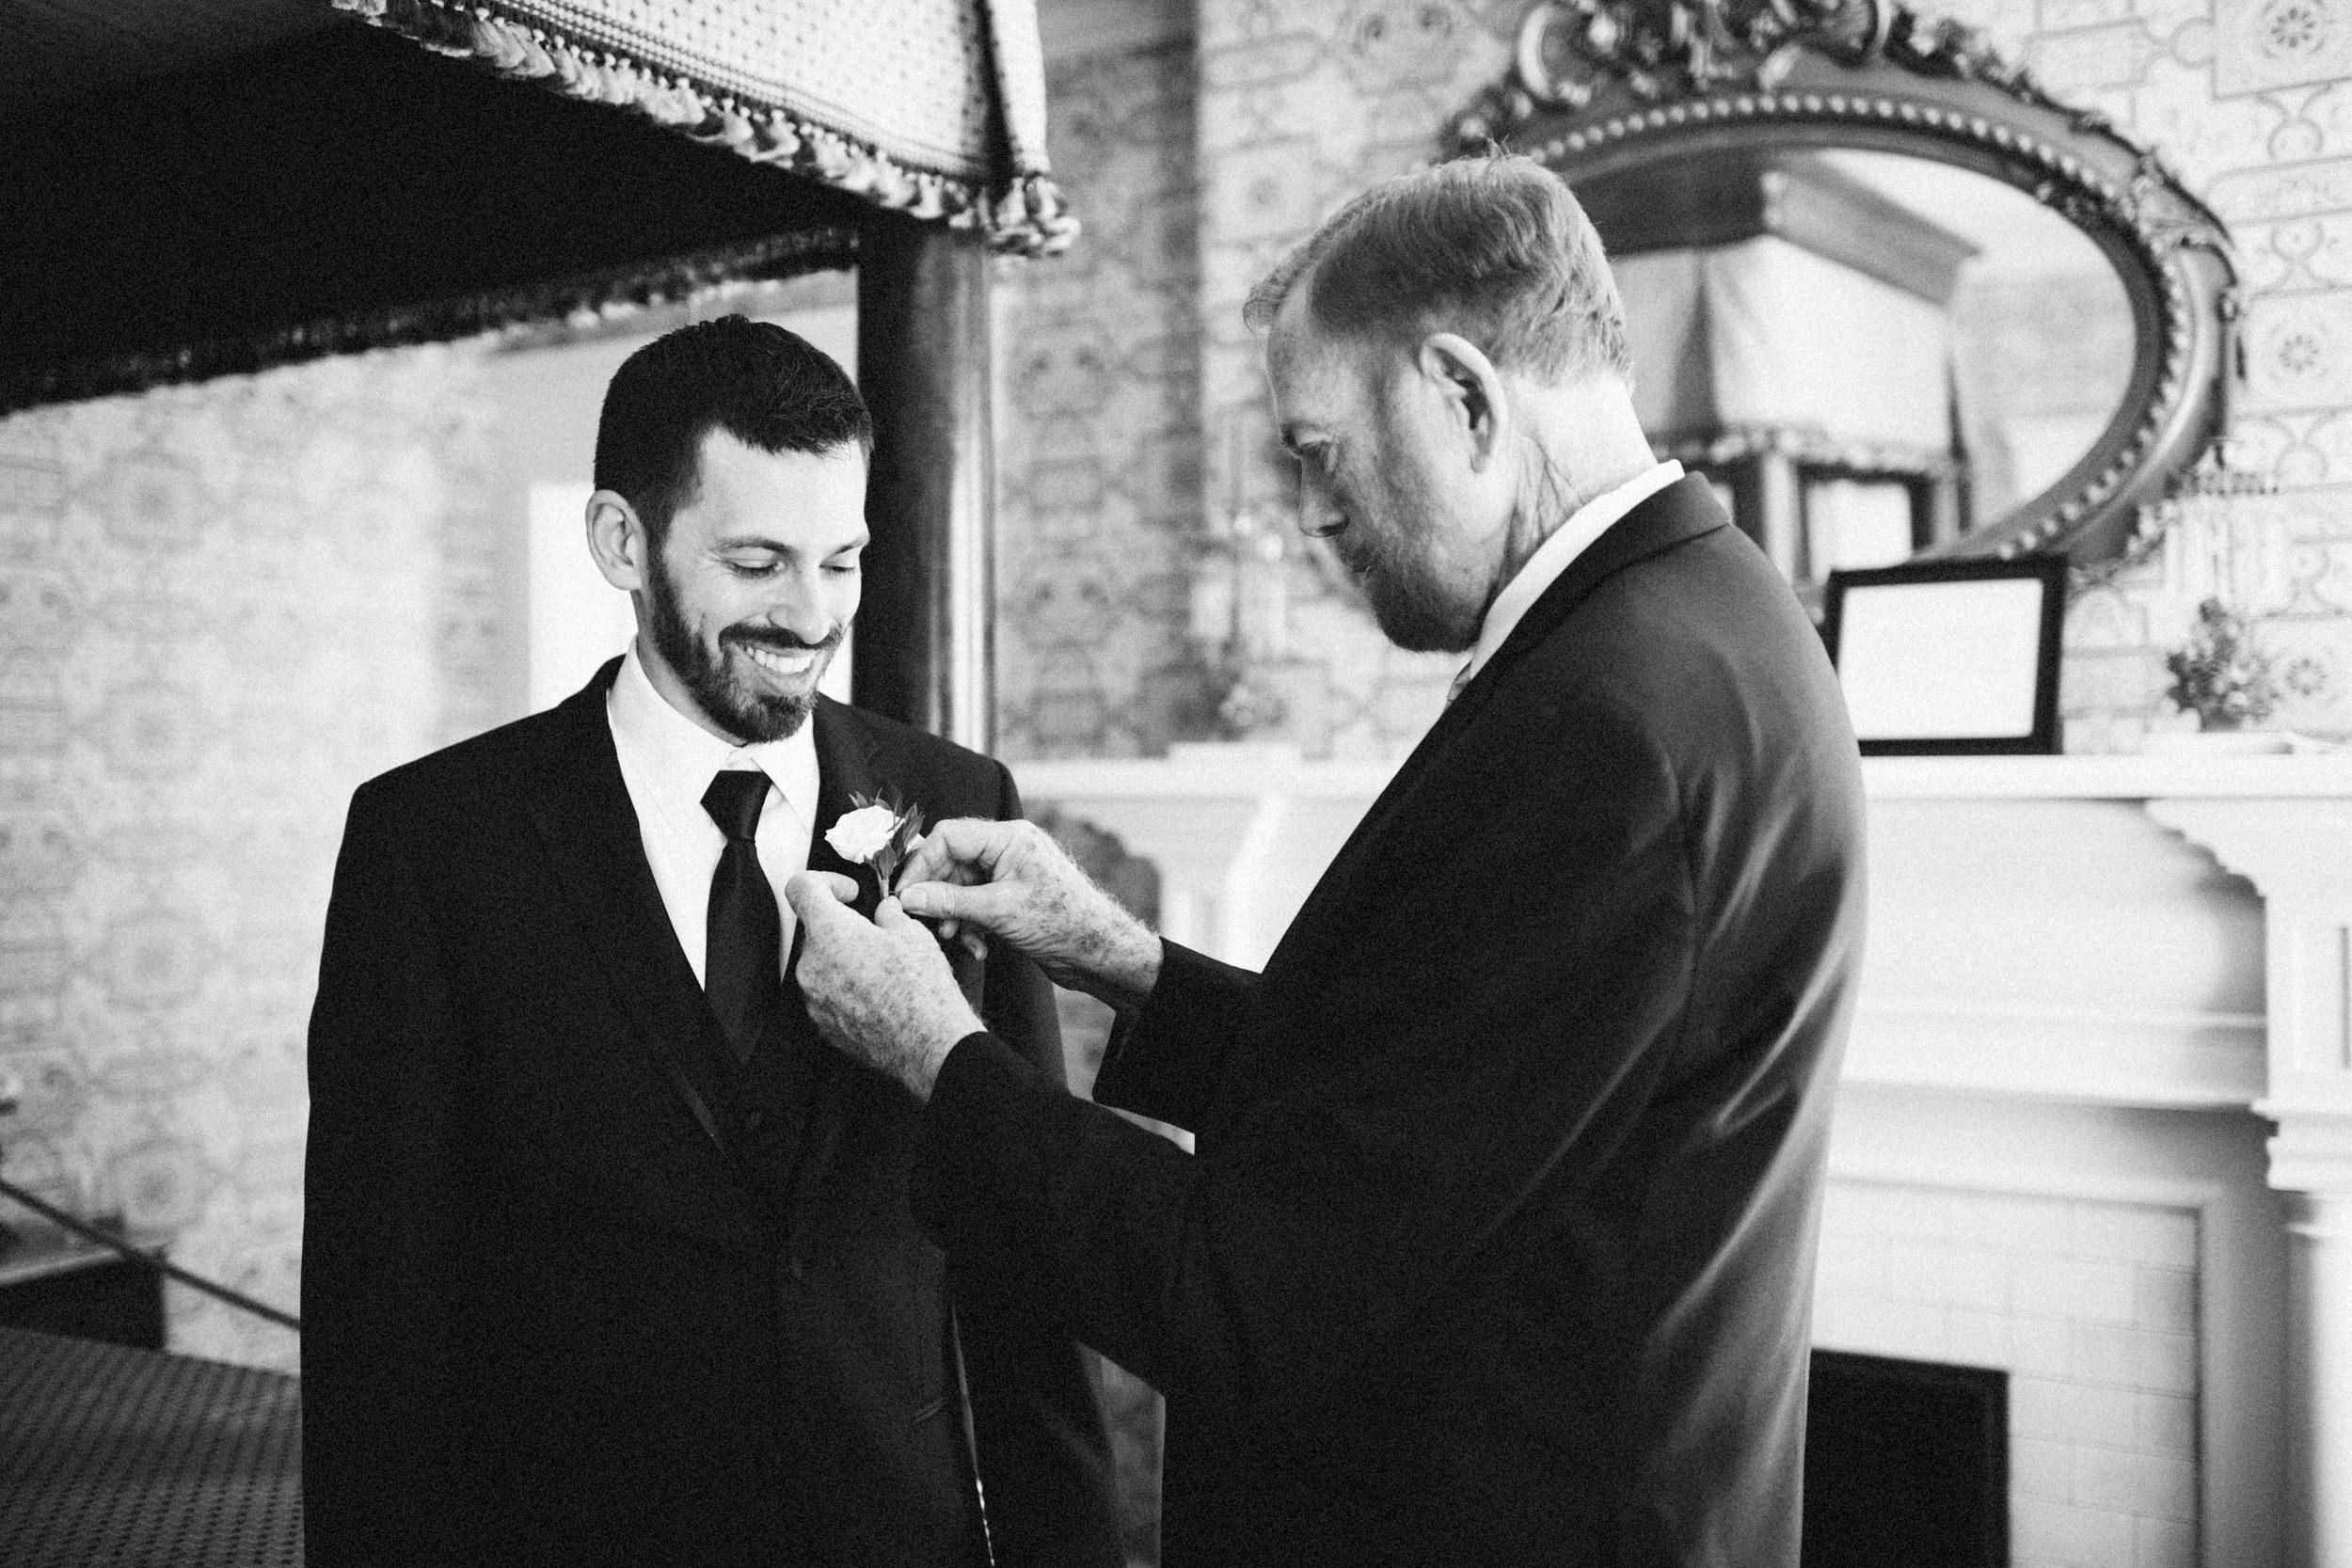 Louisville-Kentucky-Wedding-Elopement-Photographer-Sarah-Katherine-Davis-Photography-Whitehall-Classic-Timeless-Garden-Wedding-58.jpg